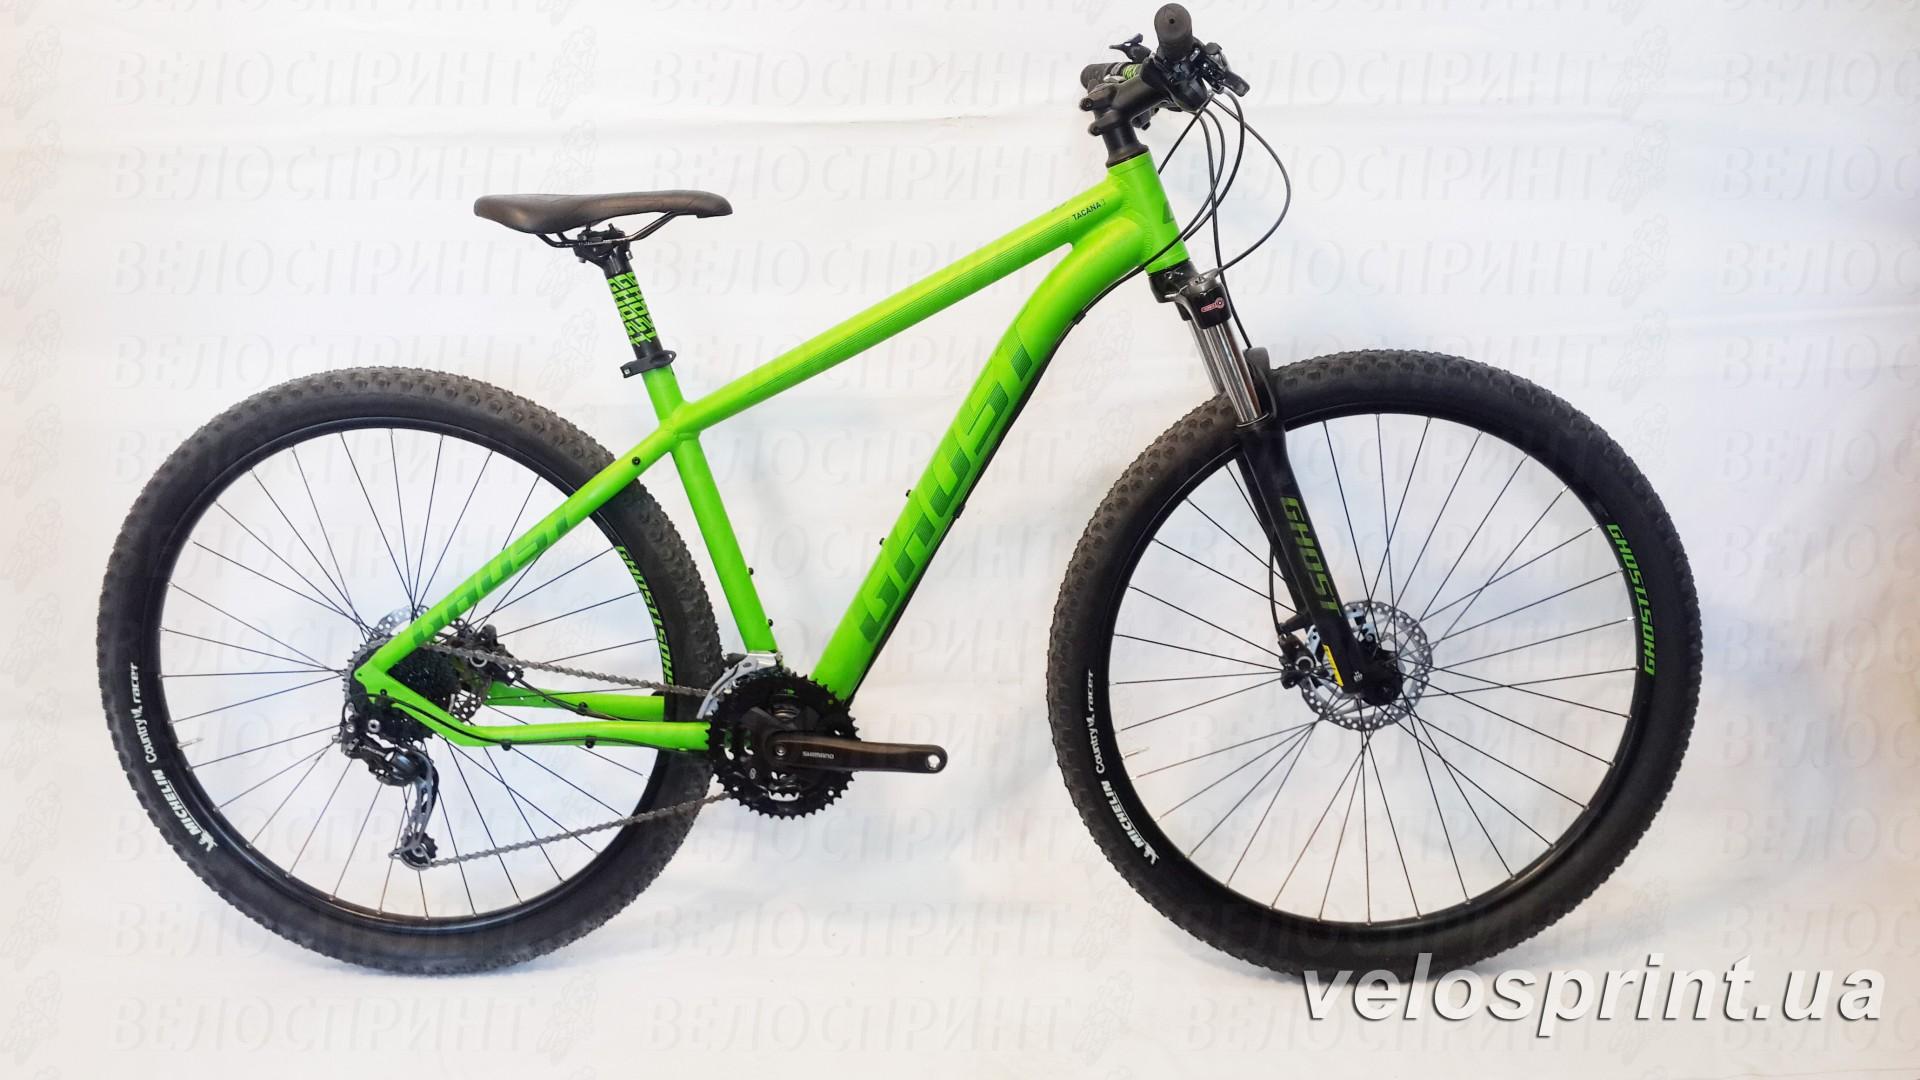 Велосипед GHOST Tacana 3 green/darkgreen/black общий вид год 2016